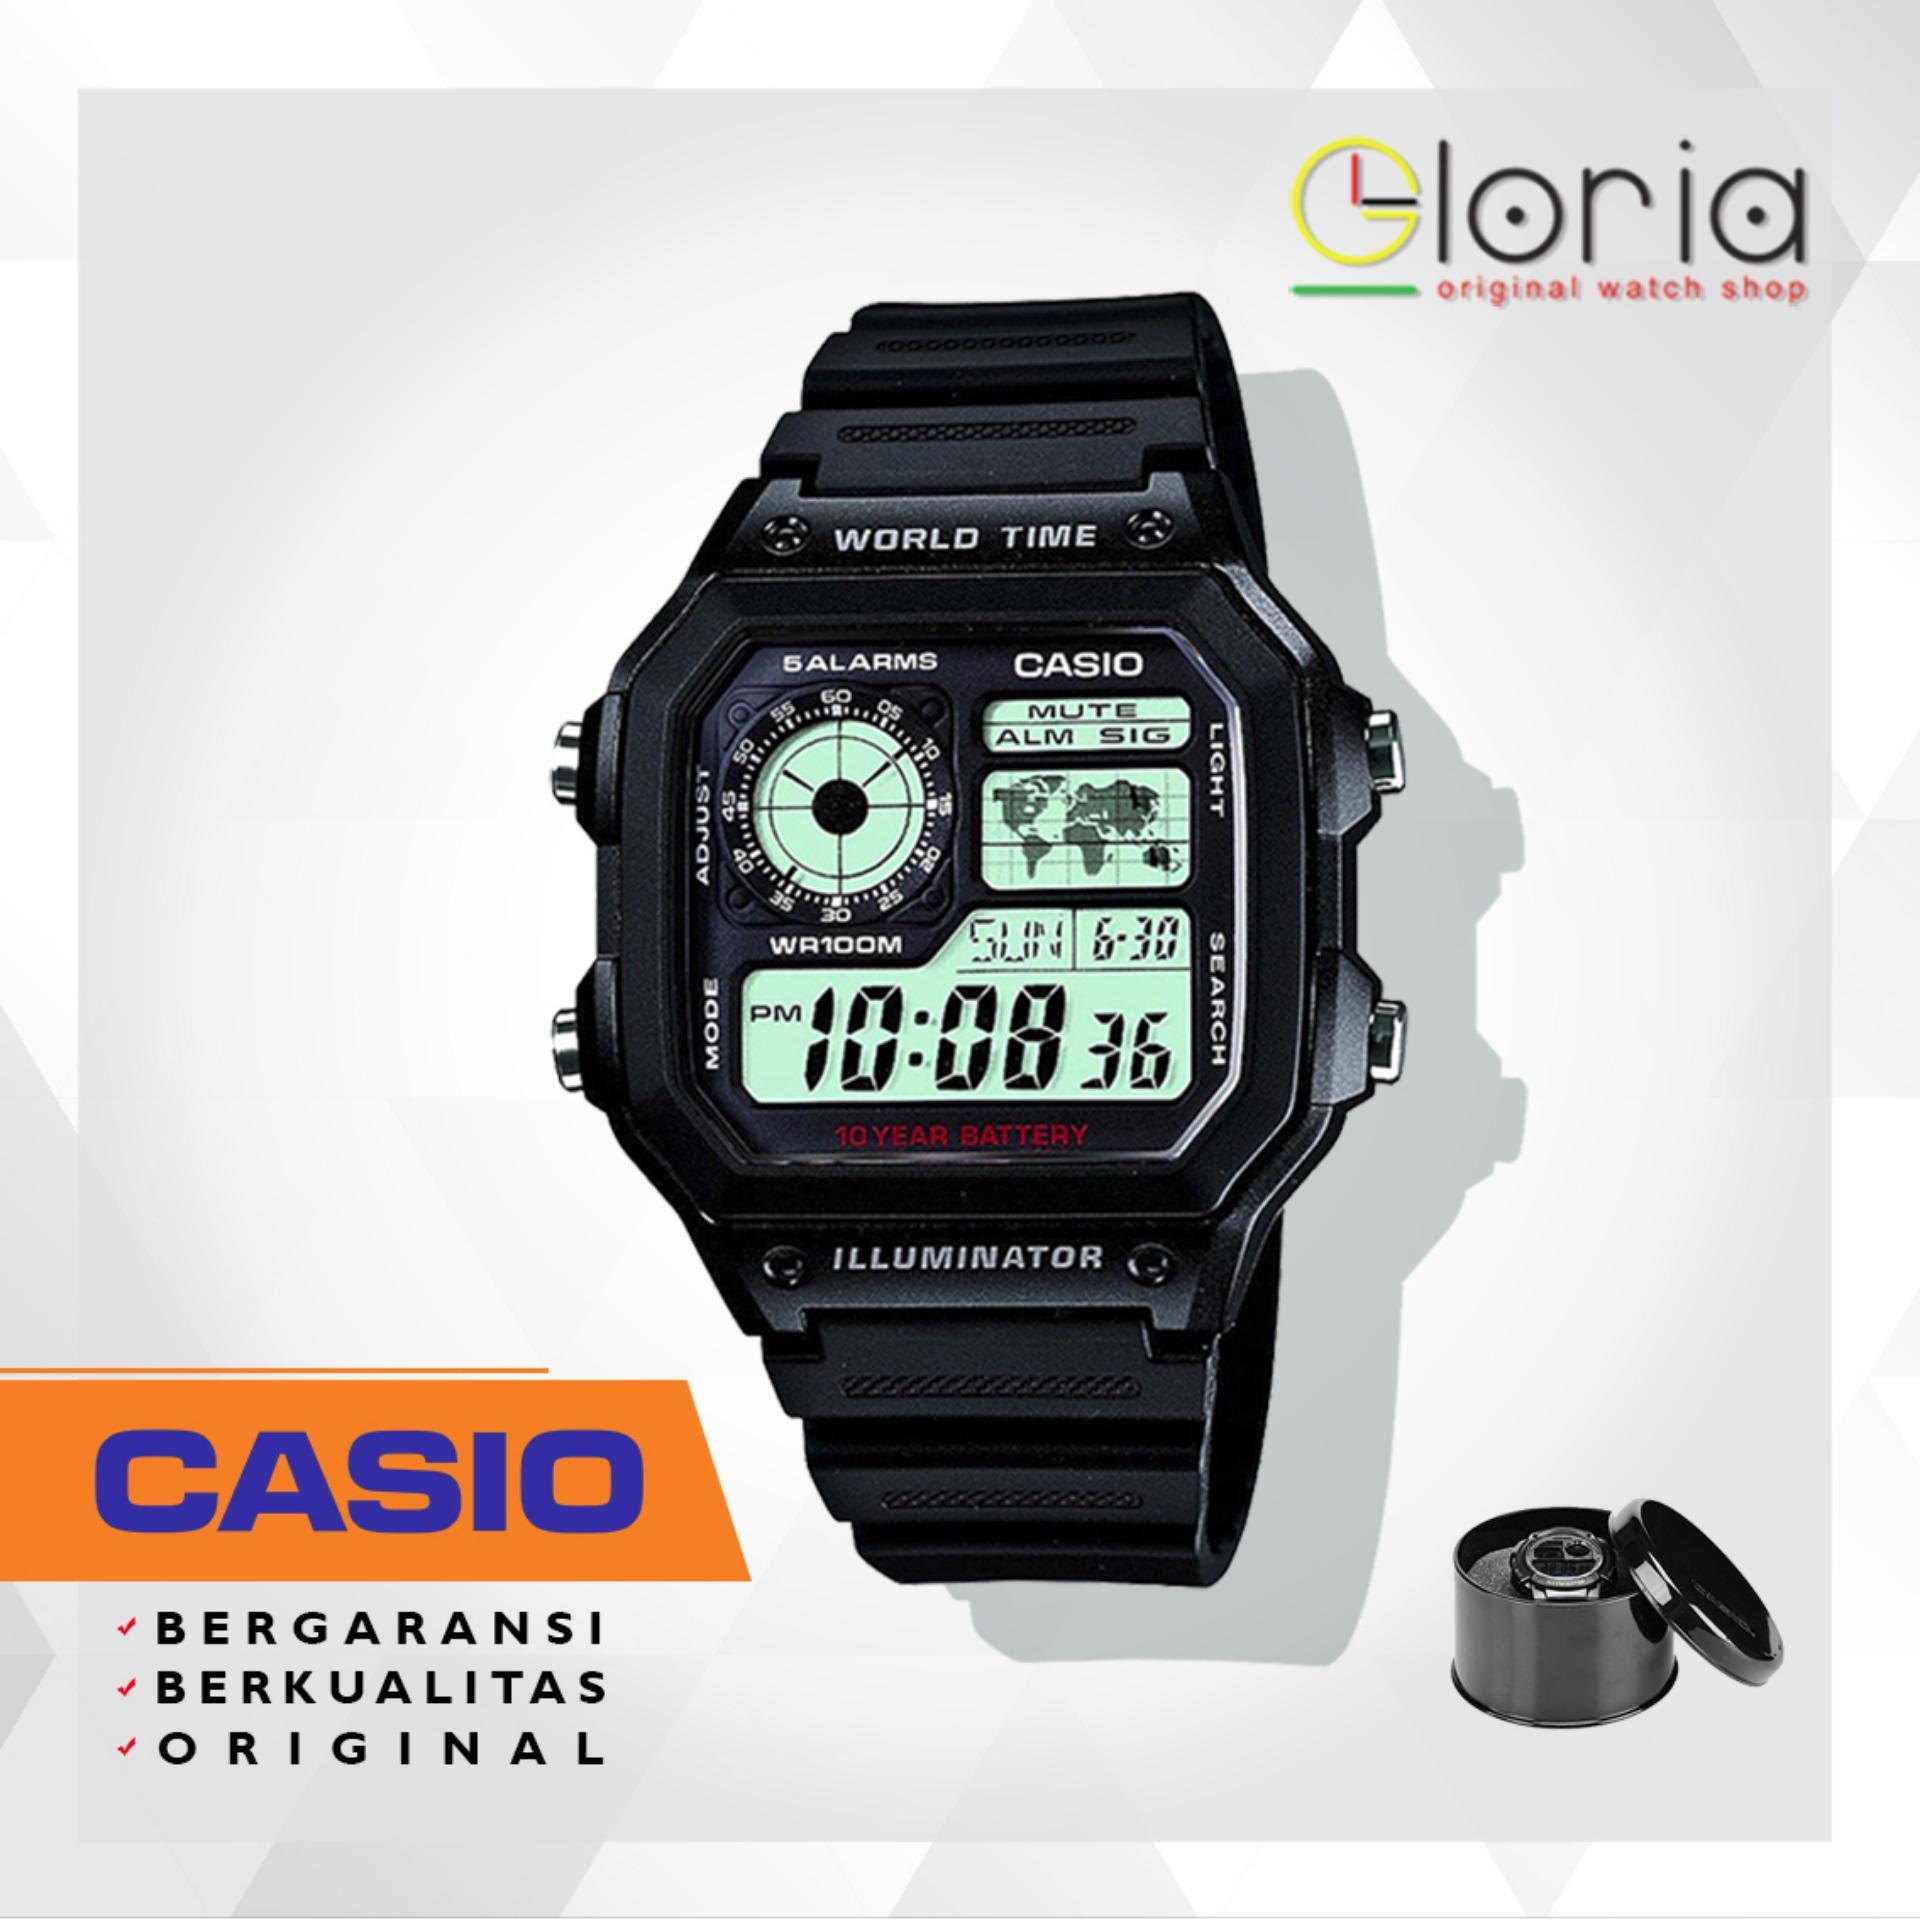 CASIO Illuminator AE-1200WH / 1200WHD Jam Tangan Pria Sport Tali Karet / Stainless Digital